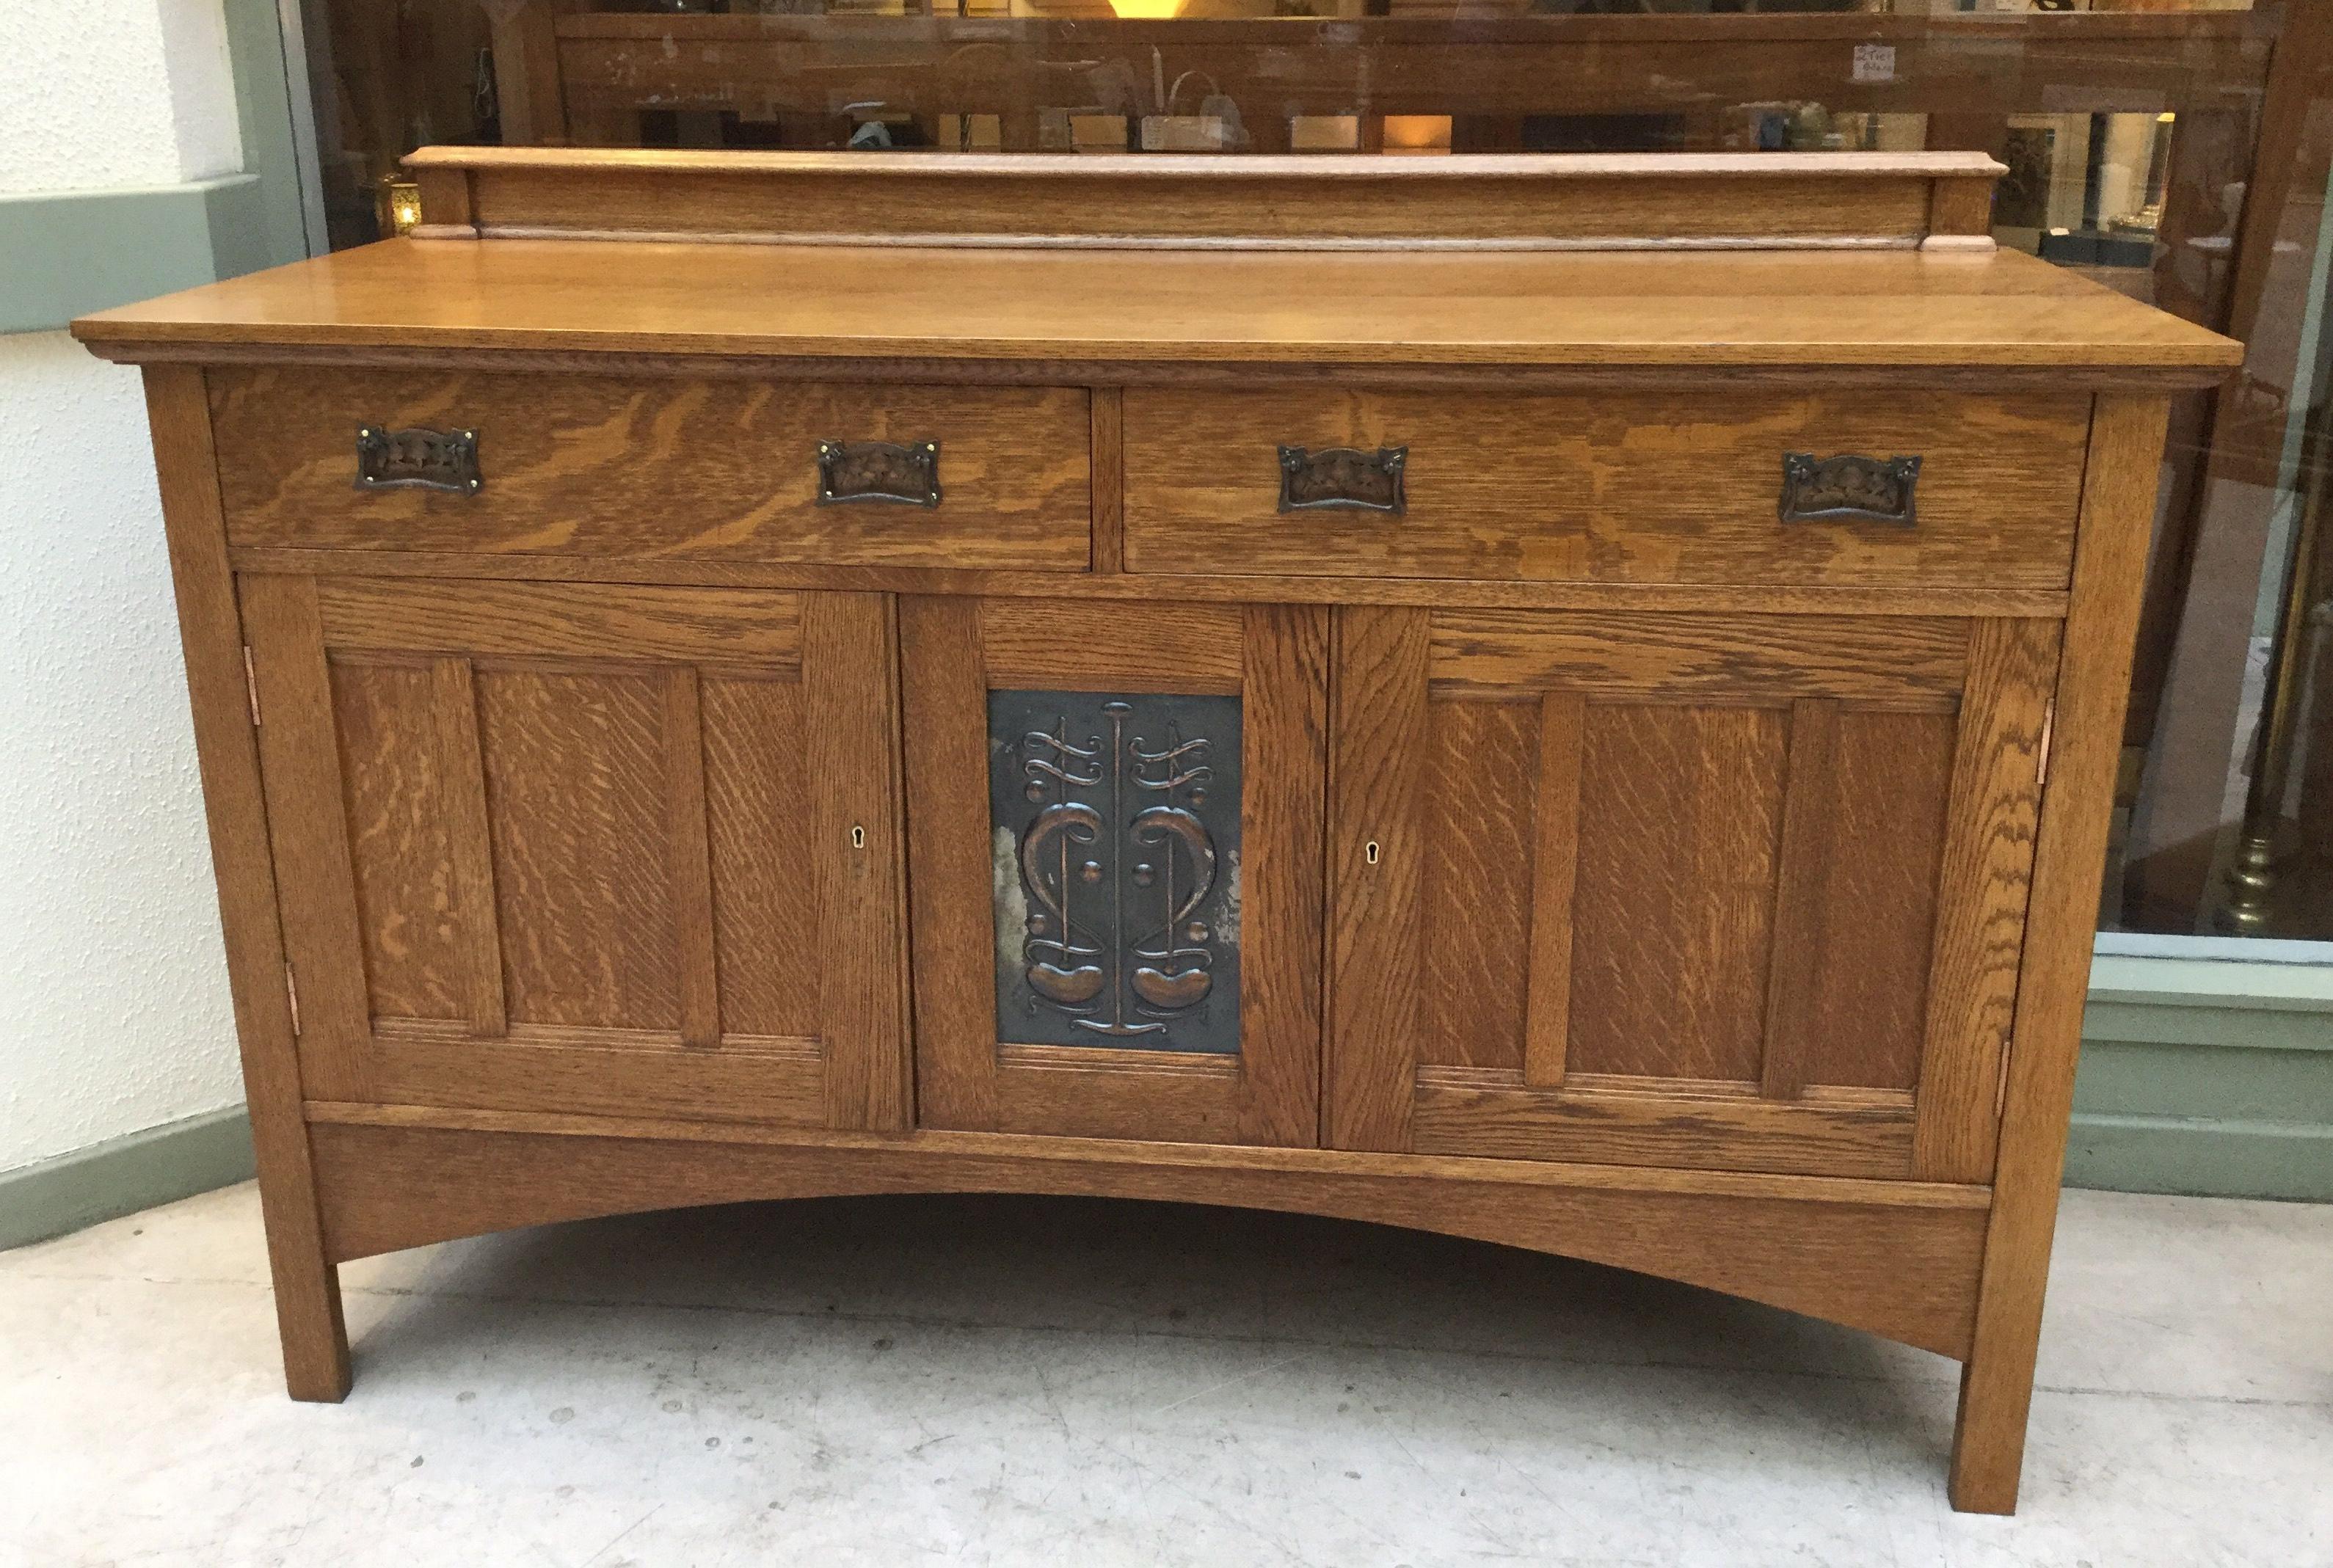 Oak Sideboard, With Original Beaten Copper Panel (View 12 of 20)